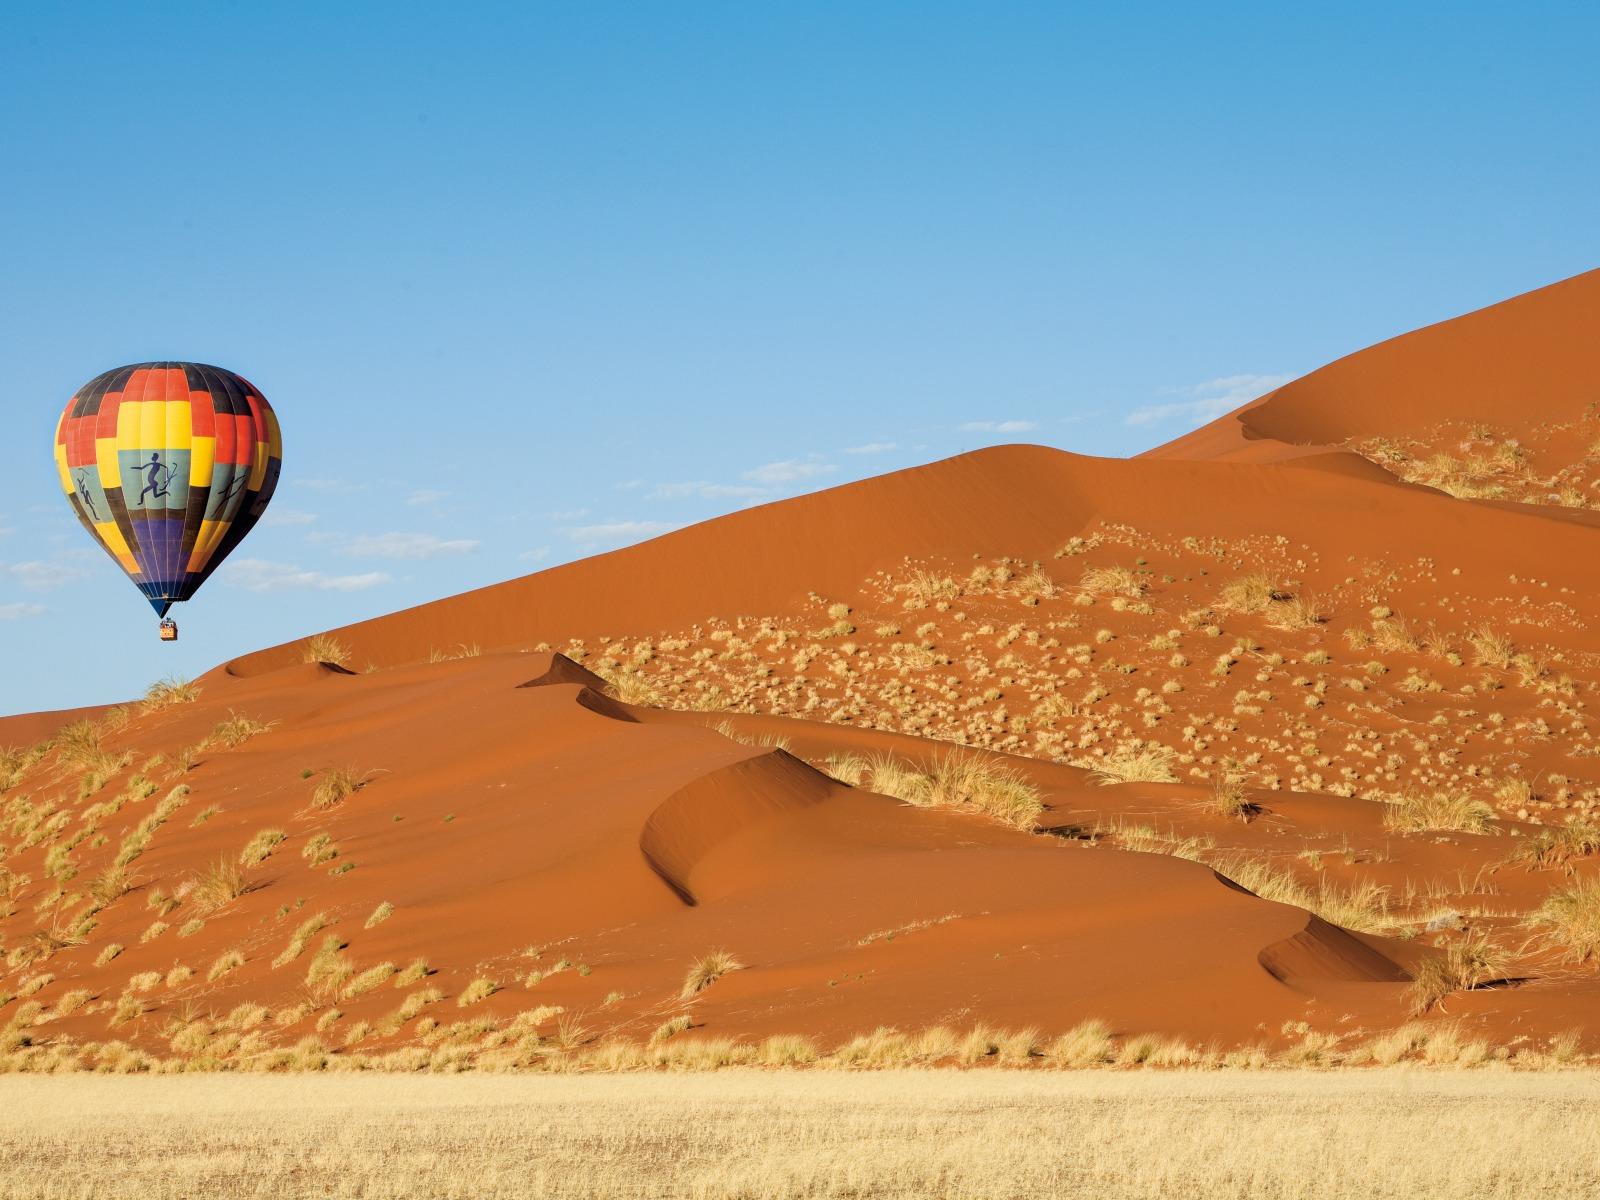 Wilderness Safari - Balloon_MM_MG_5674a_1600x1200.jpg